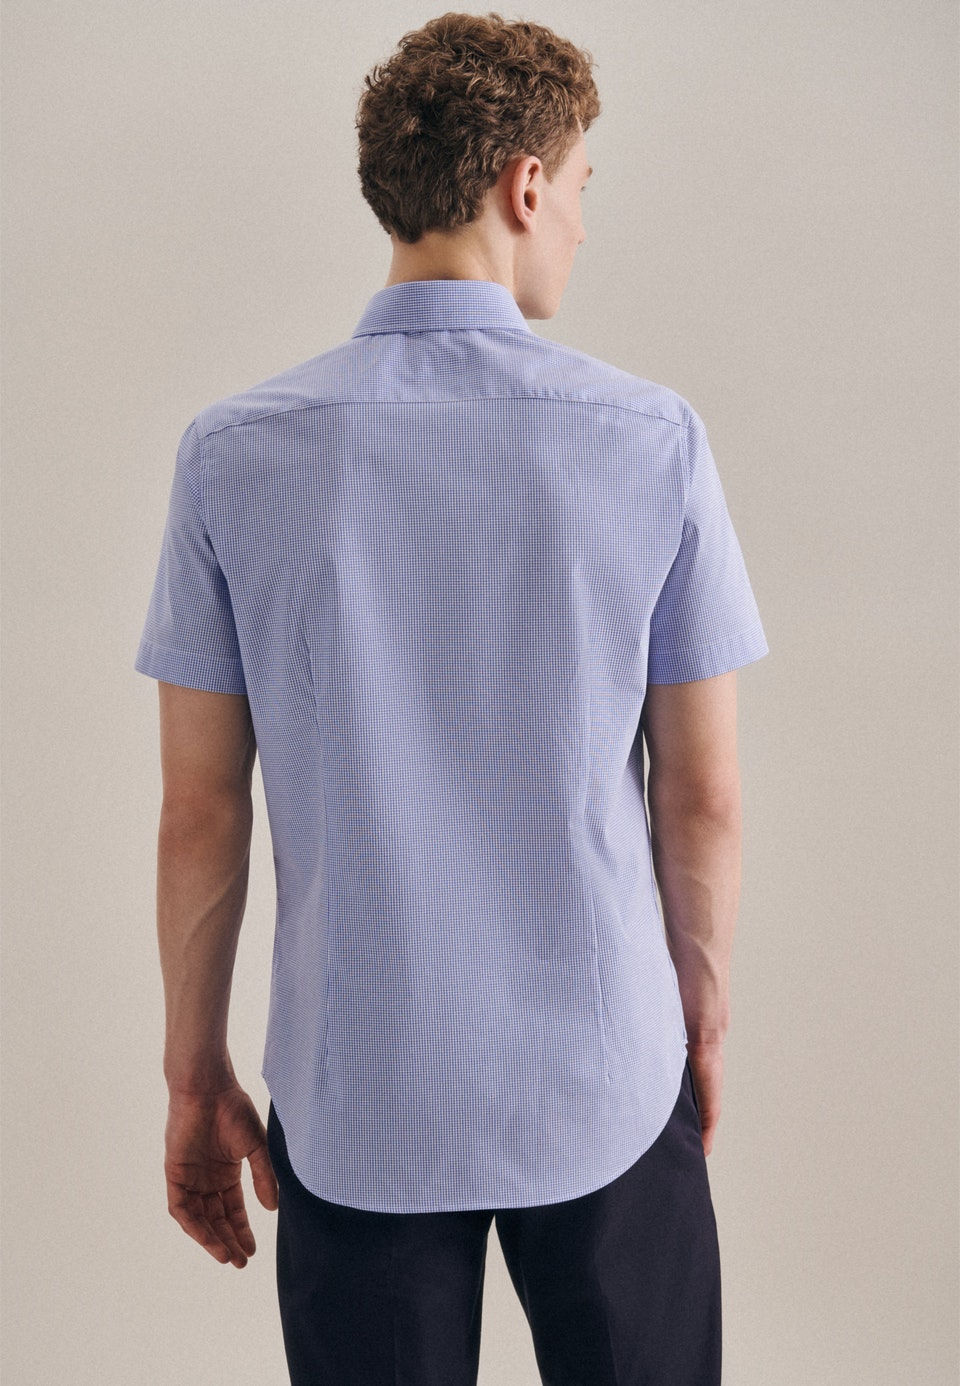 Non-iron Poplin Short sleeve Business Shirt in Shaped with Kent-Collar in Light blue |  Seidensticker Onlineshop